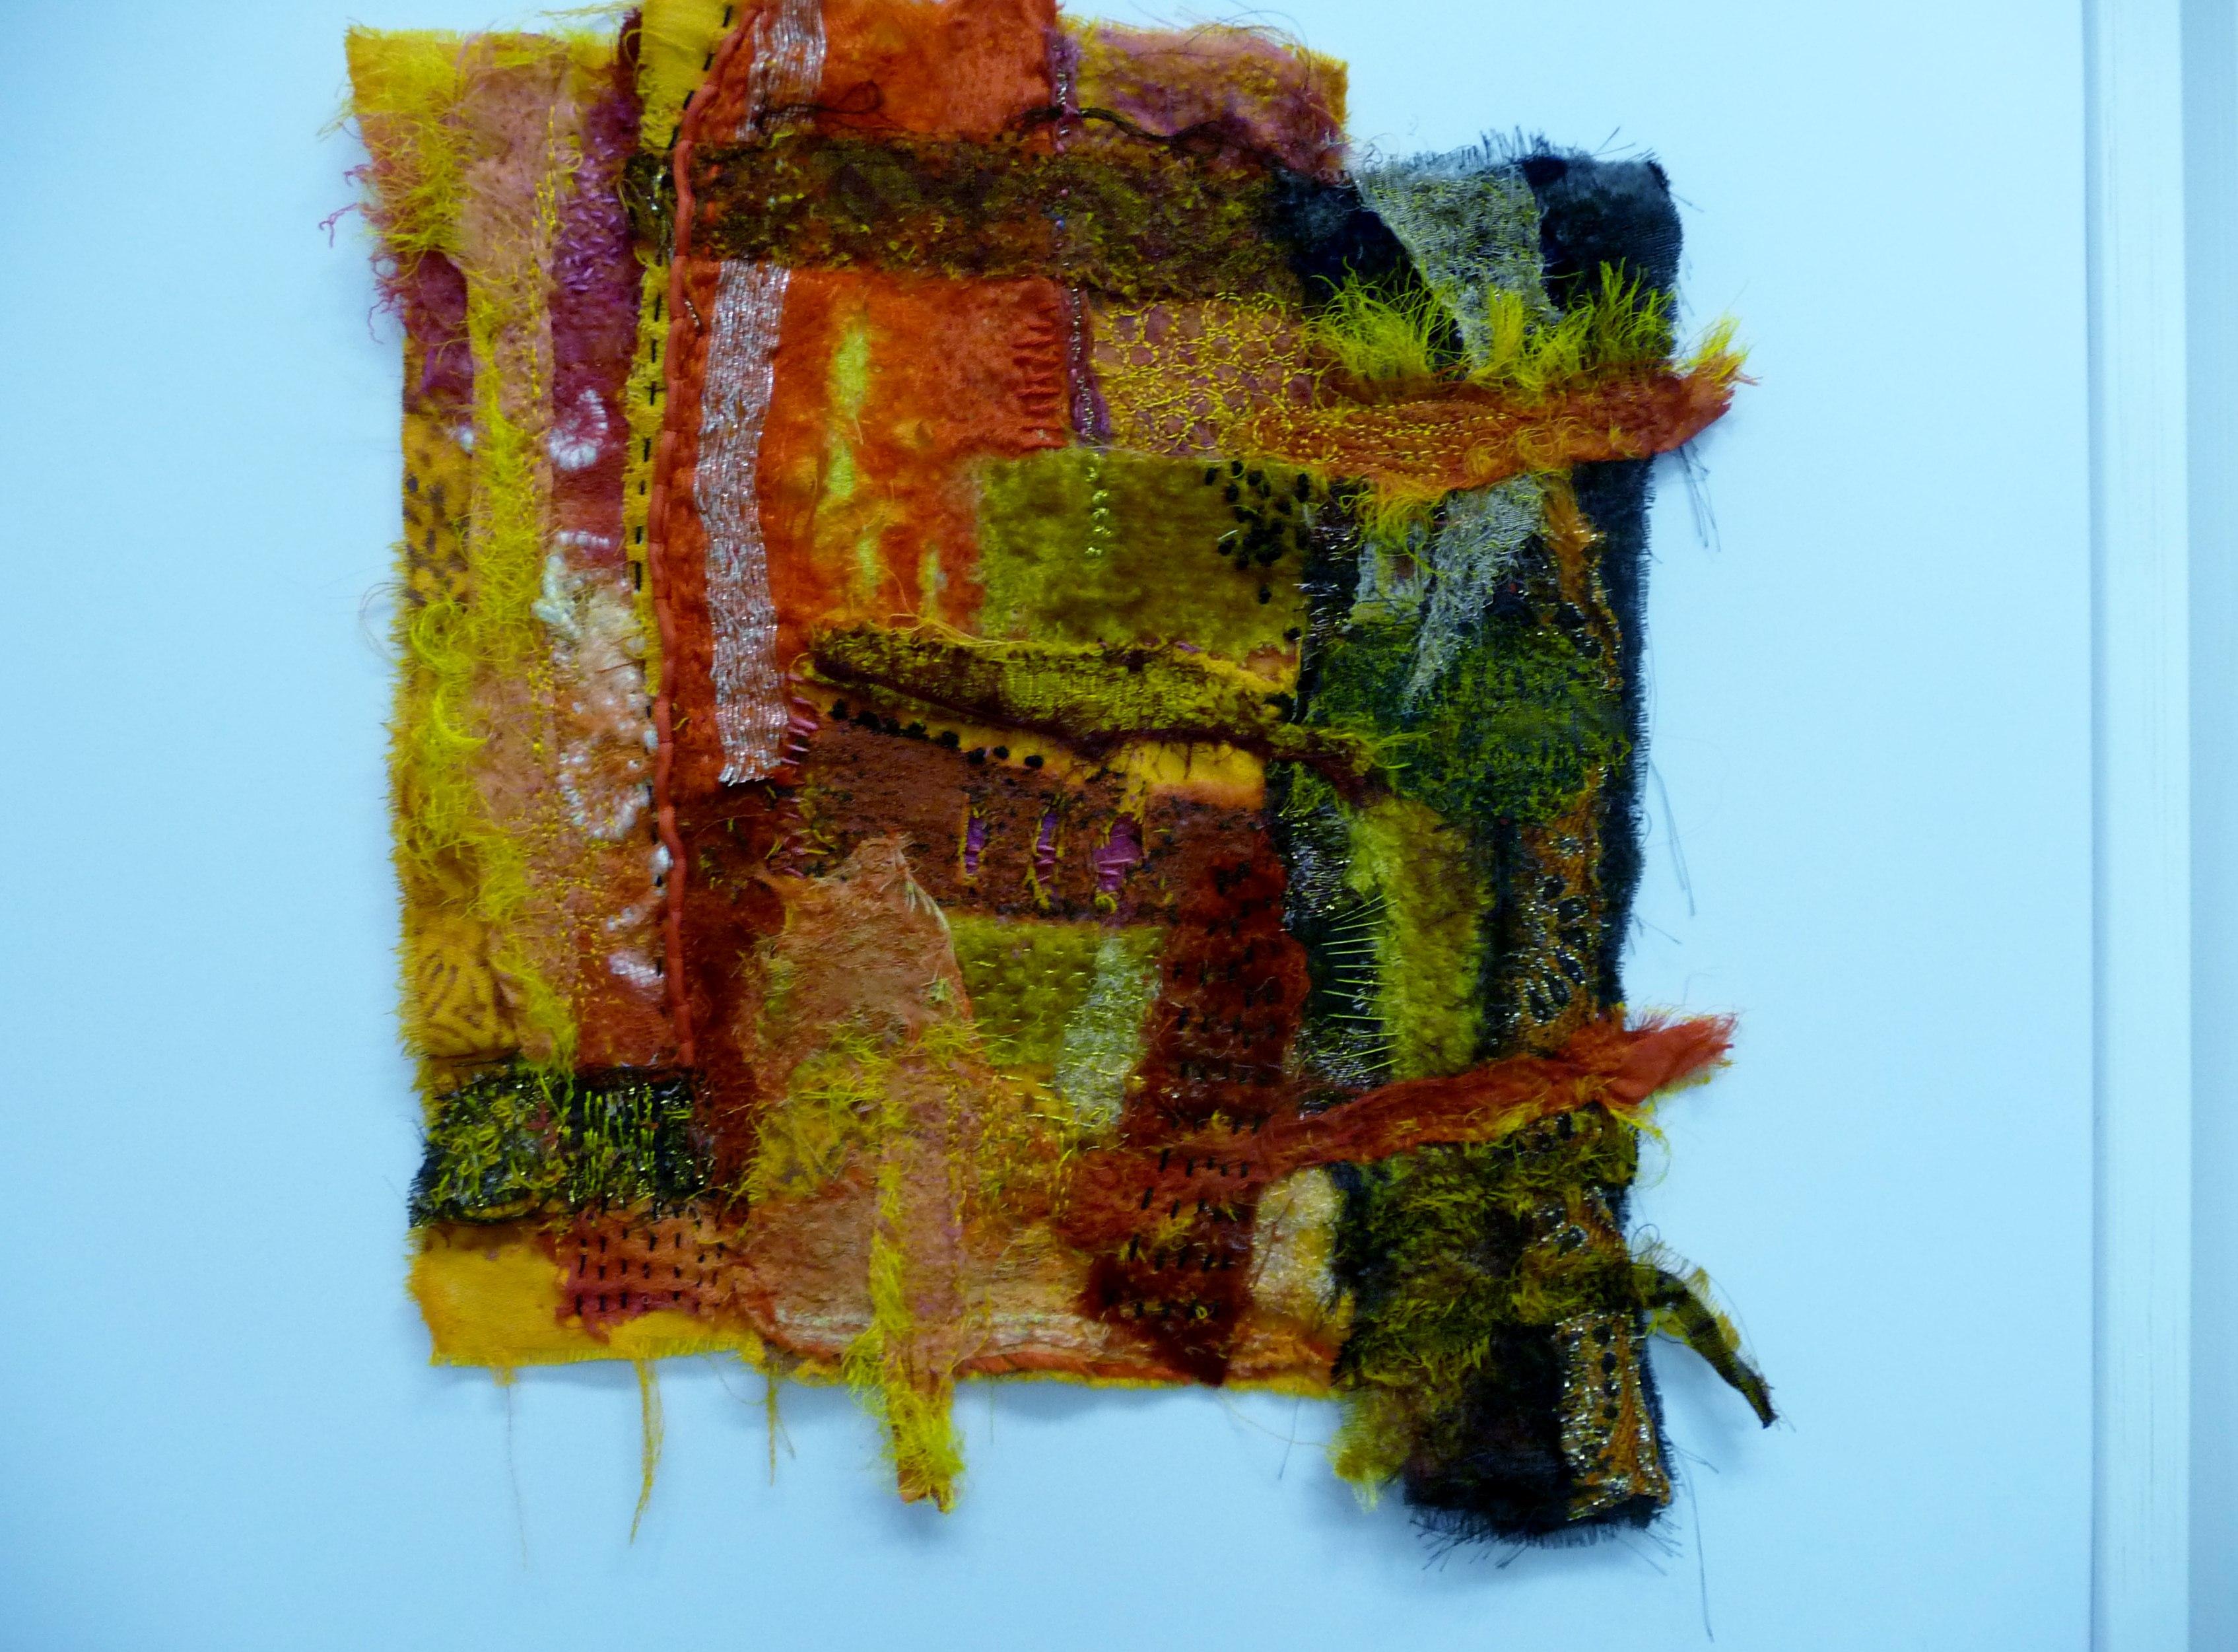 ORANGE INDIAN DOOR by Beryl Woodcroft of TX Textile group